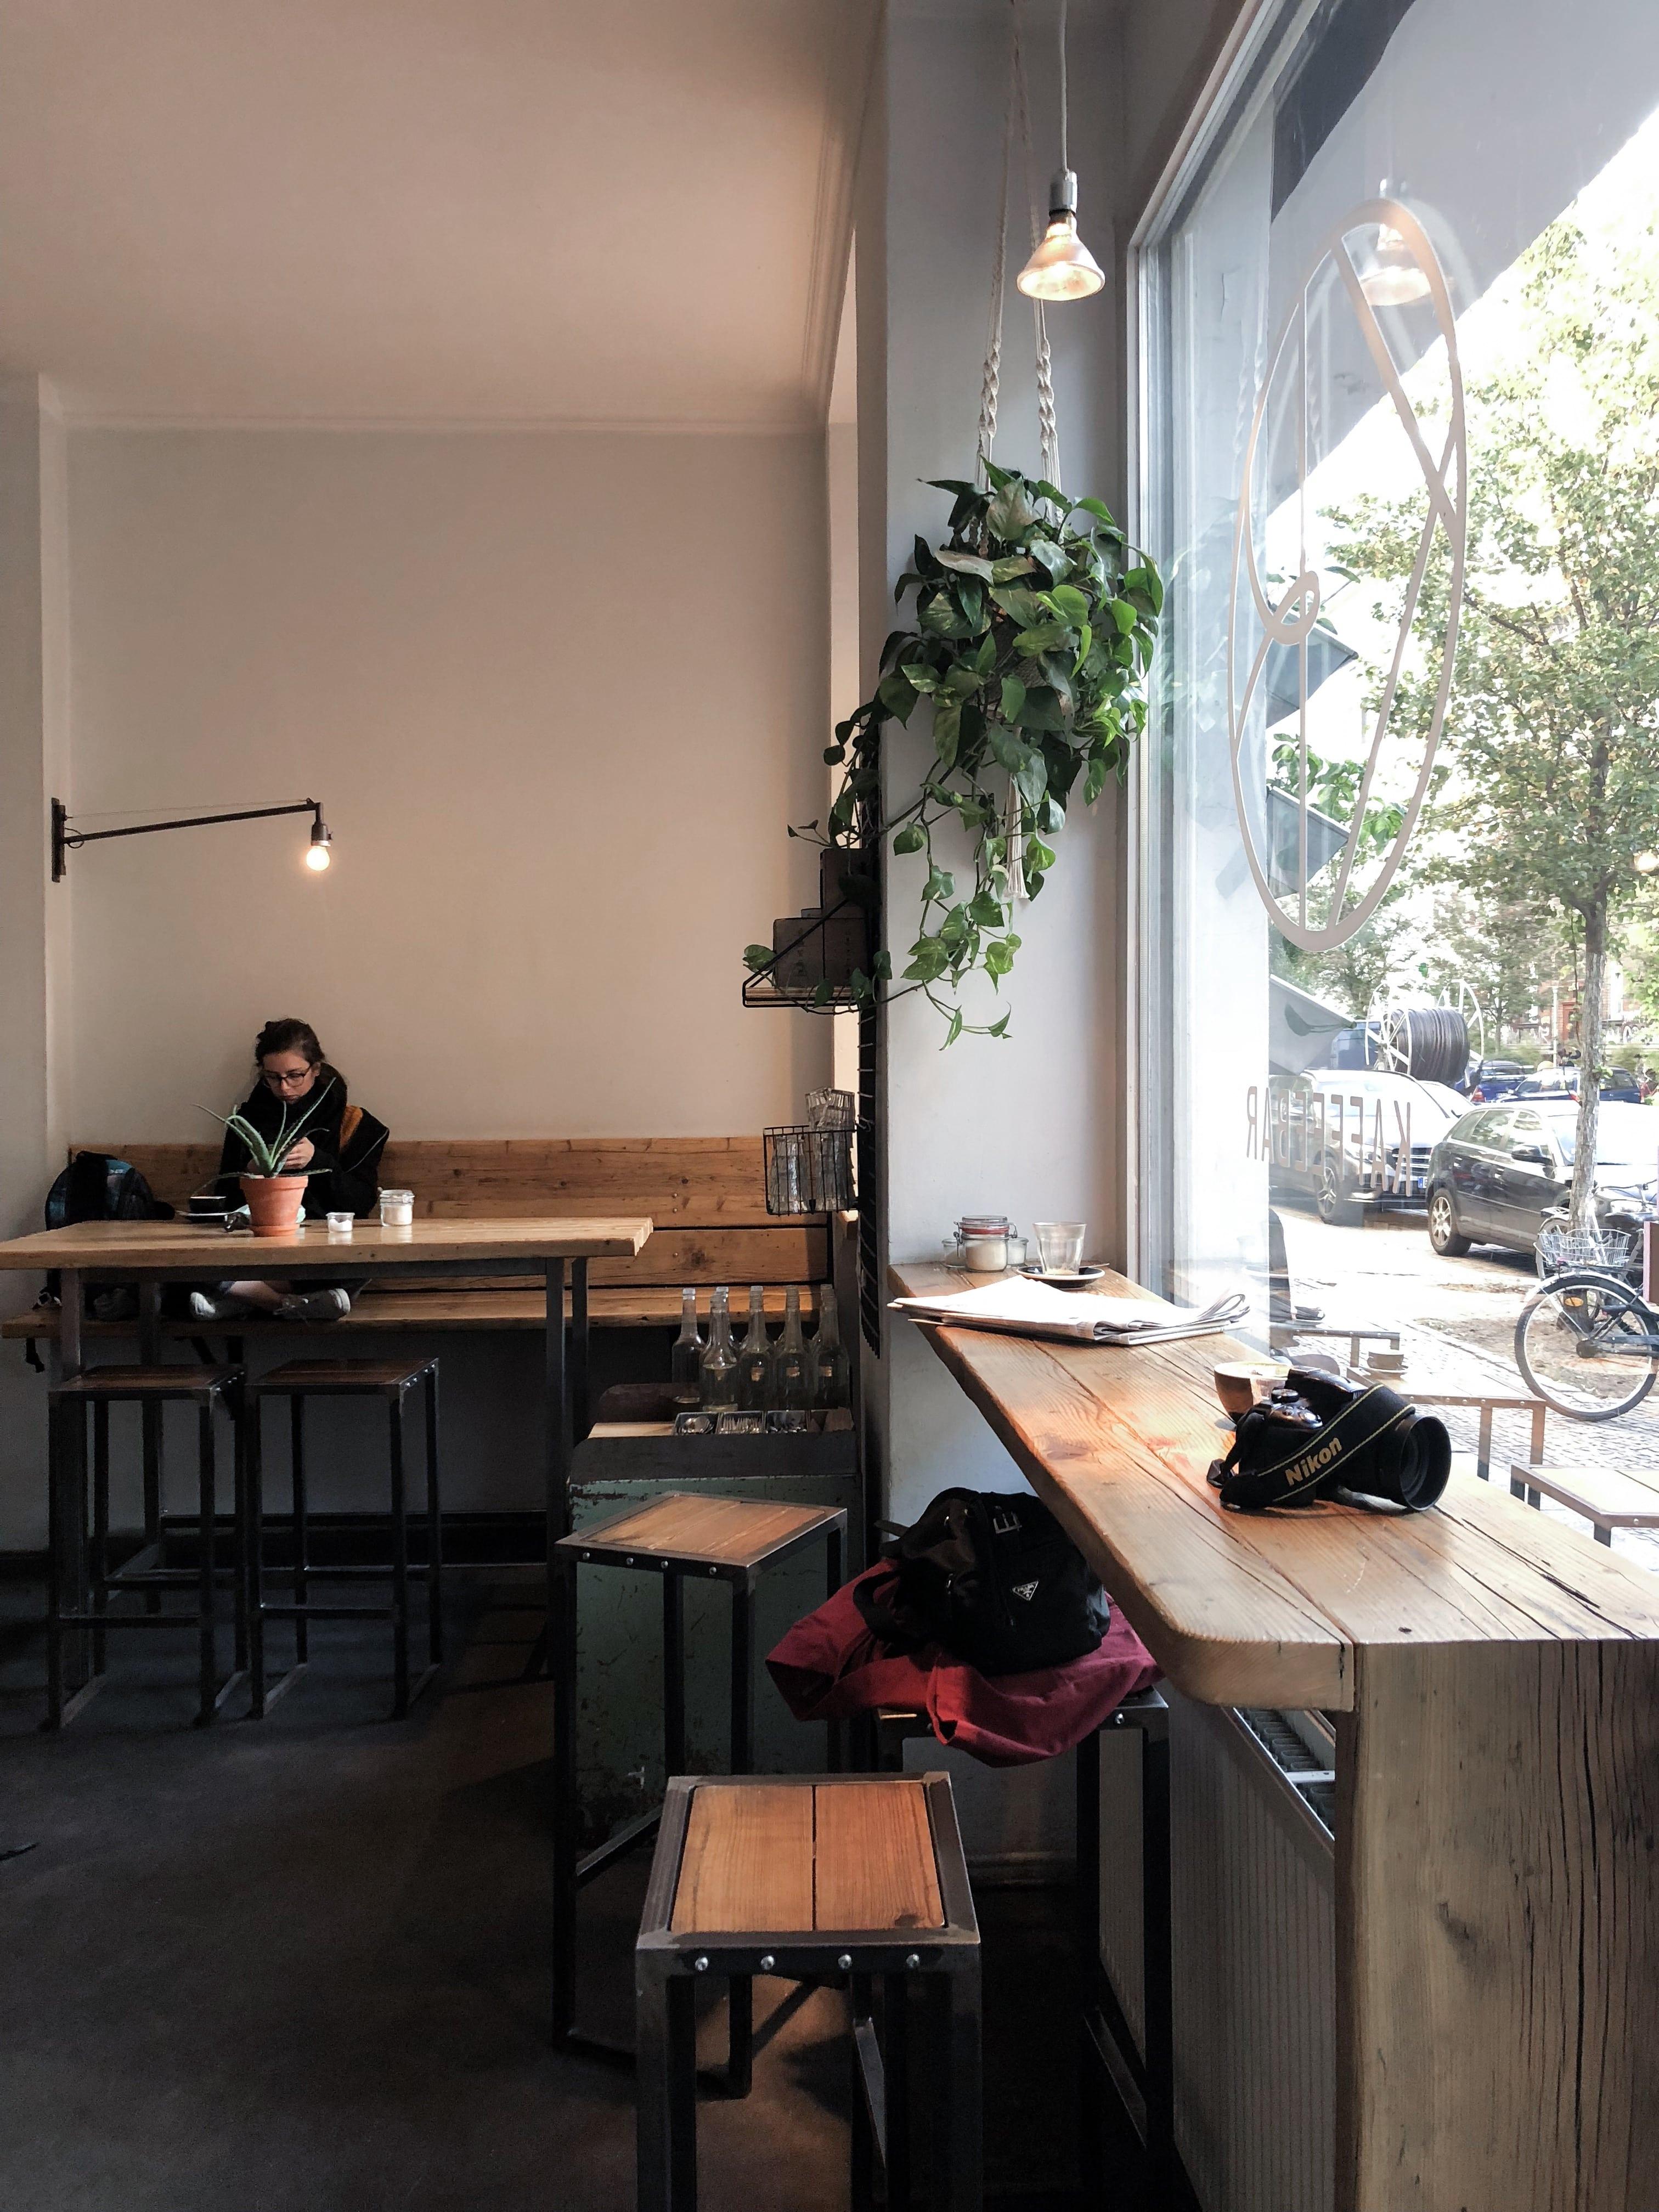 Kaffeebar With Gluten Free Options